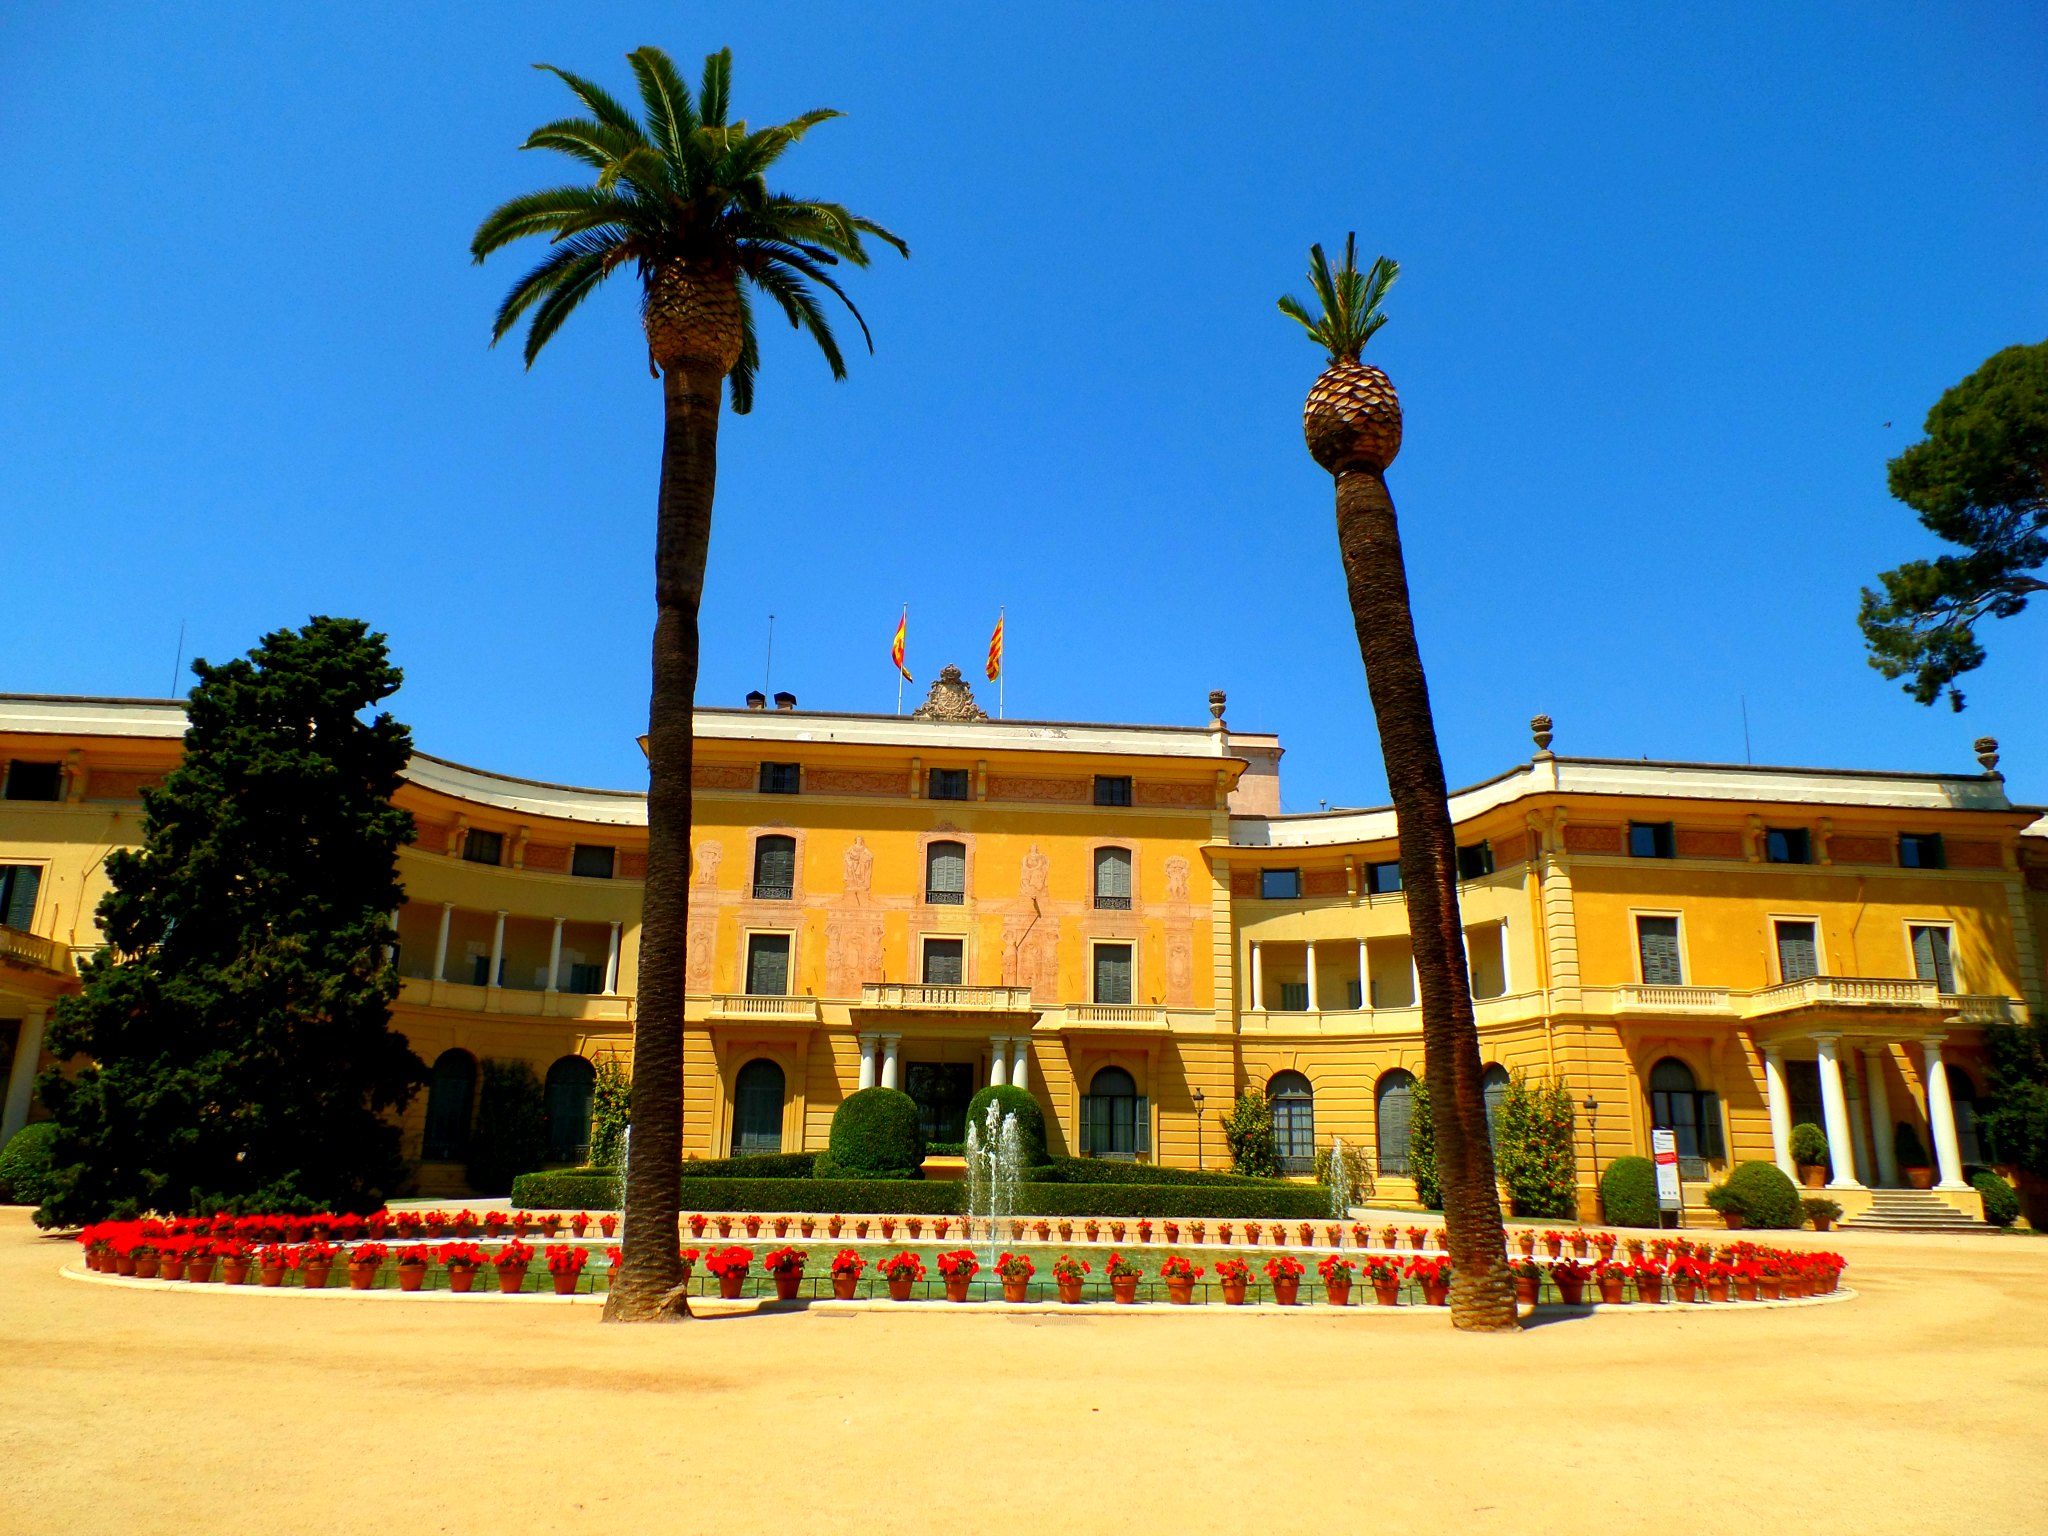 Jardines del Palau Reial, Barcelona